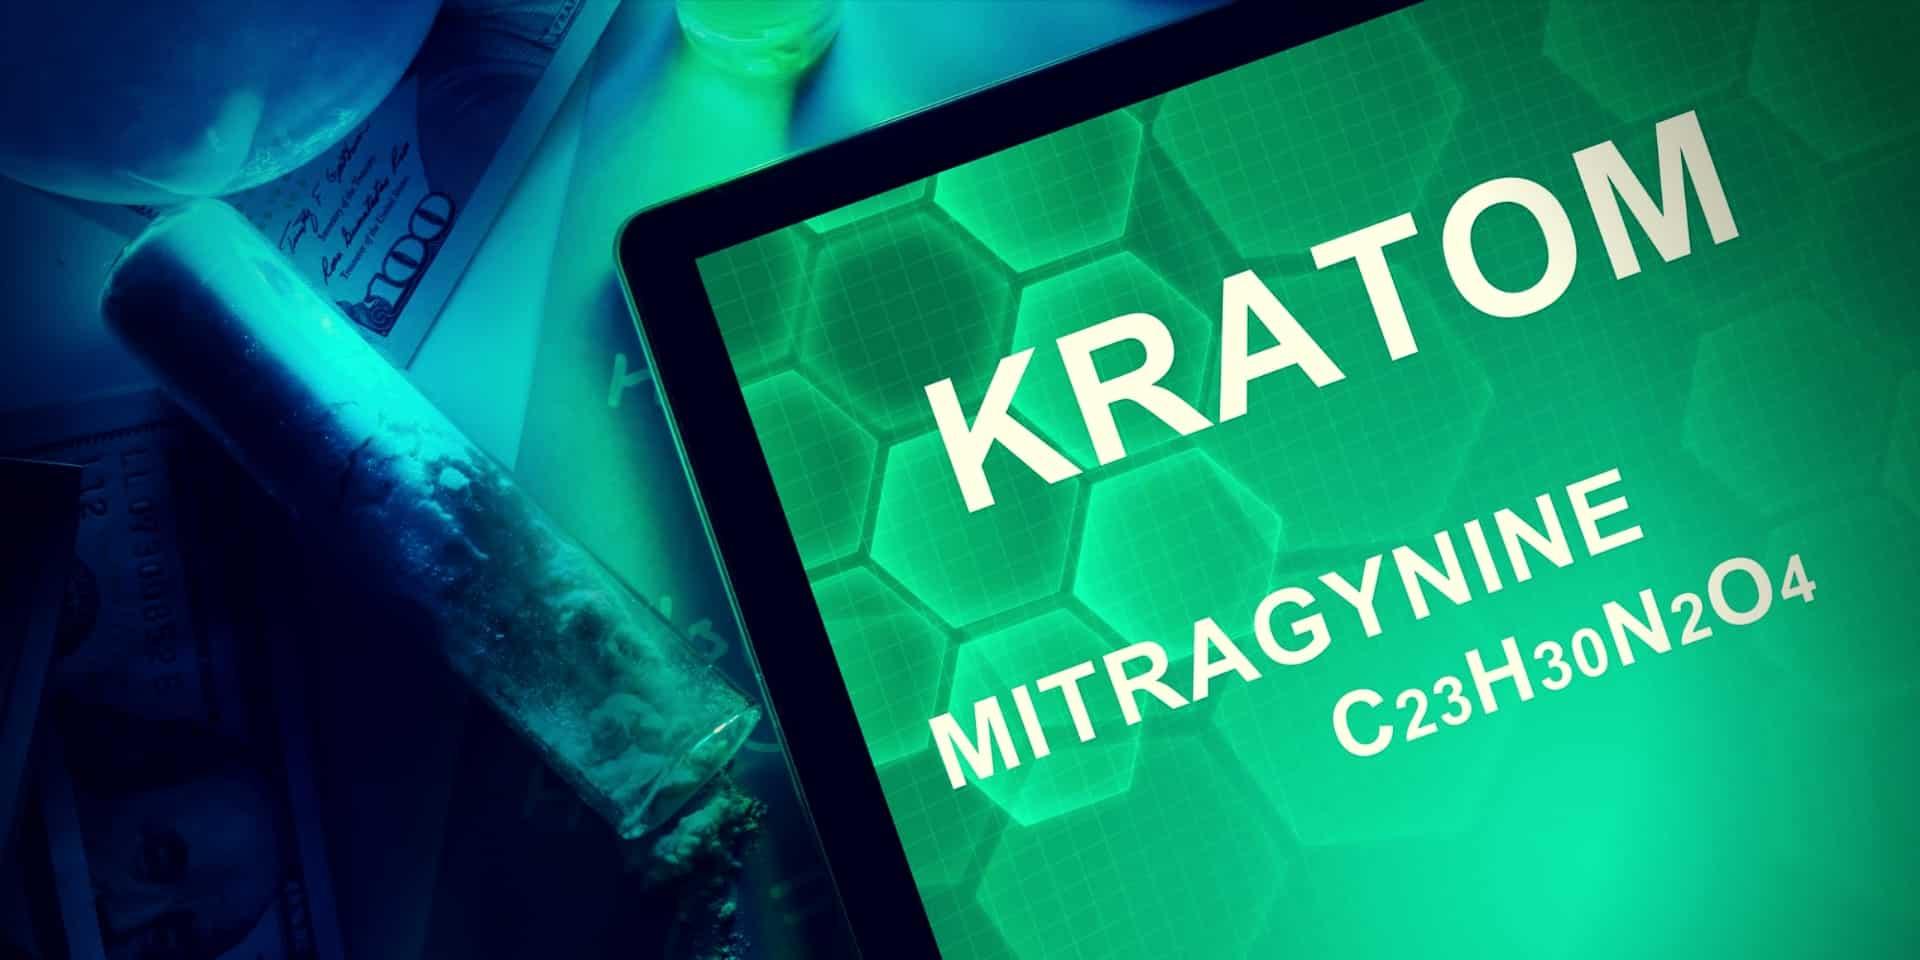 Kratom Amazon tablet with the chemical formula of Kratom (Mitragyna speciosa) Mitragynine